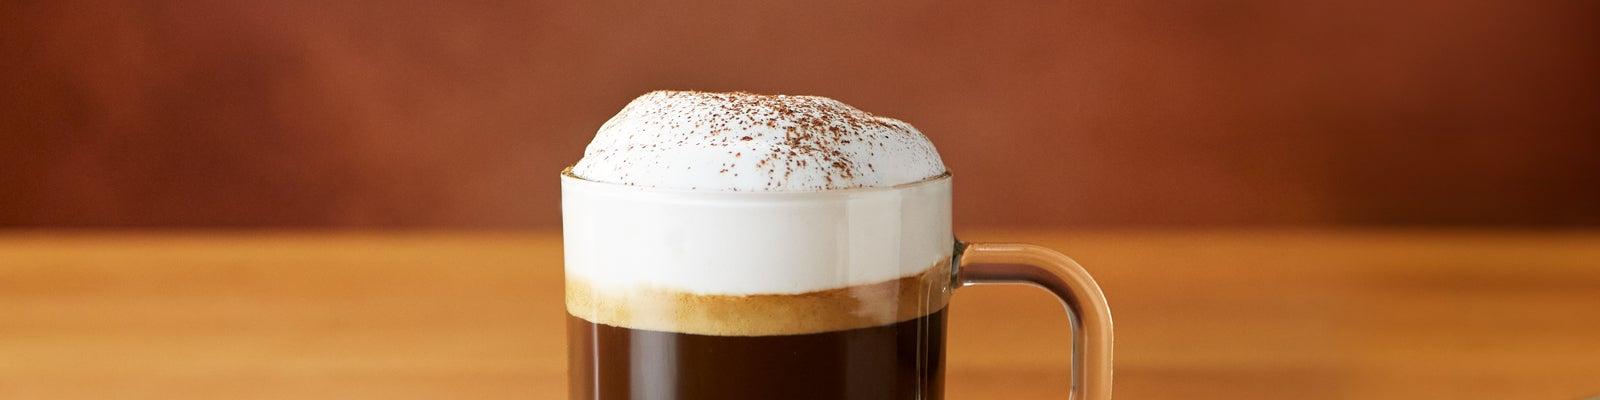 Smoked Cinnamon Coffee Recipe Header